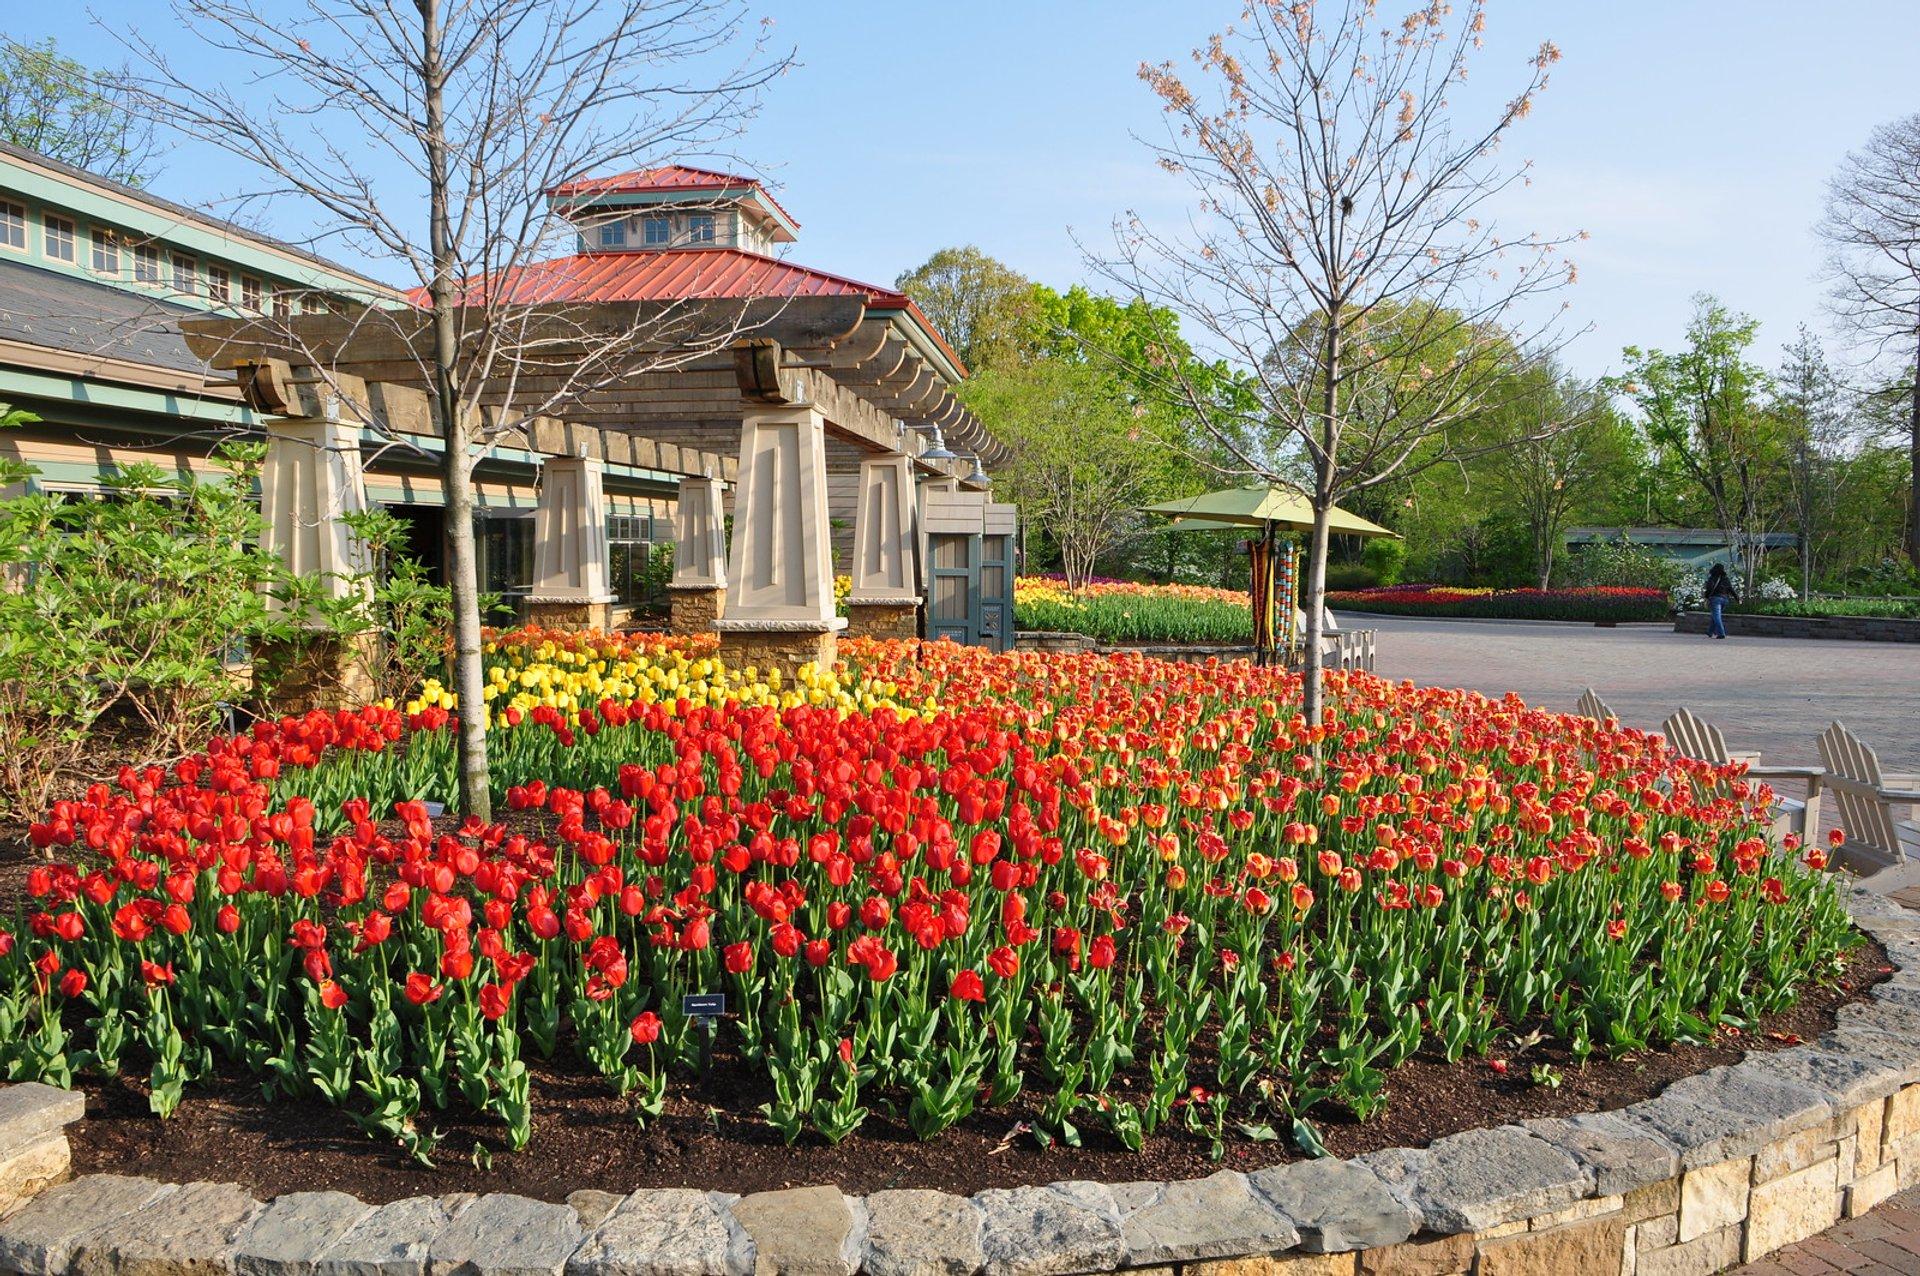 Tulips at the Cincinnati Zoo & Botanical Garden 2020